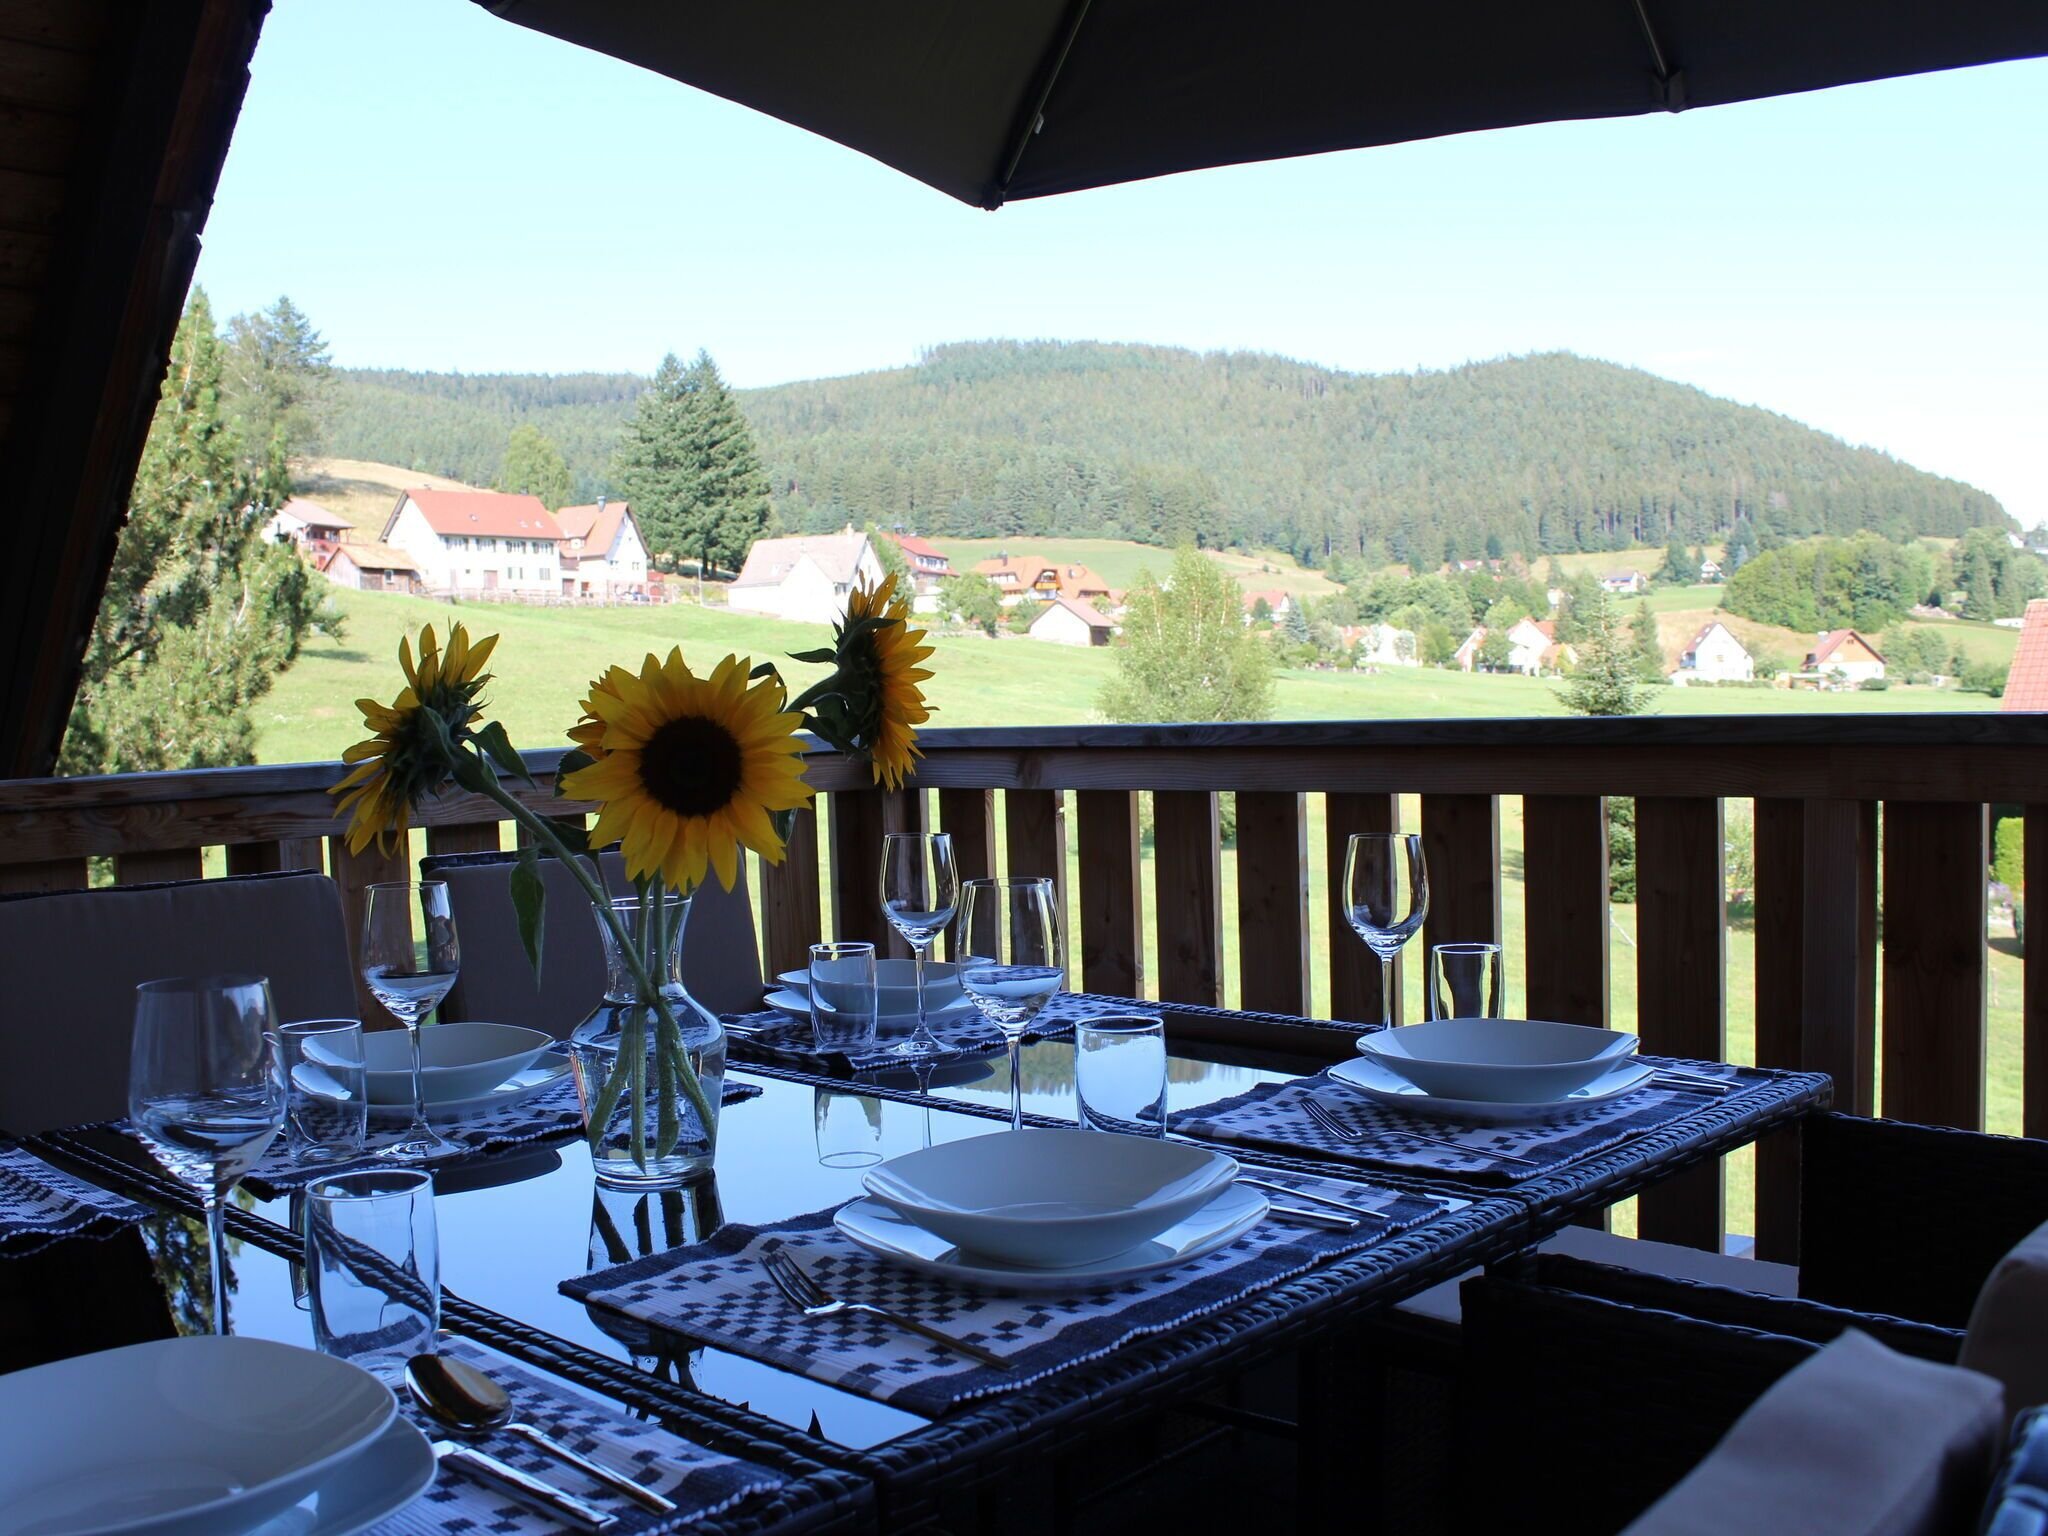 Picturesque Apartment In Baiersbronn With Bar Precos Promocoes E Comentarios Expedia Com Br